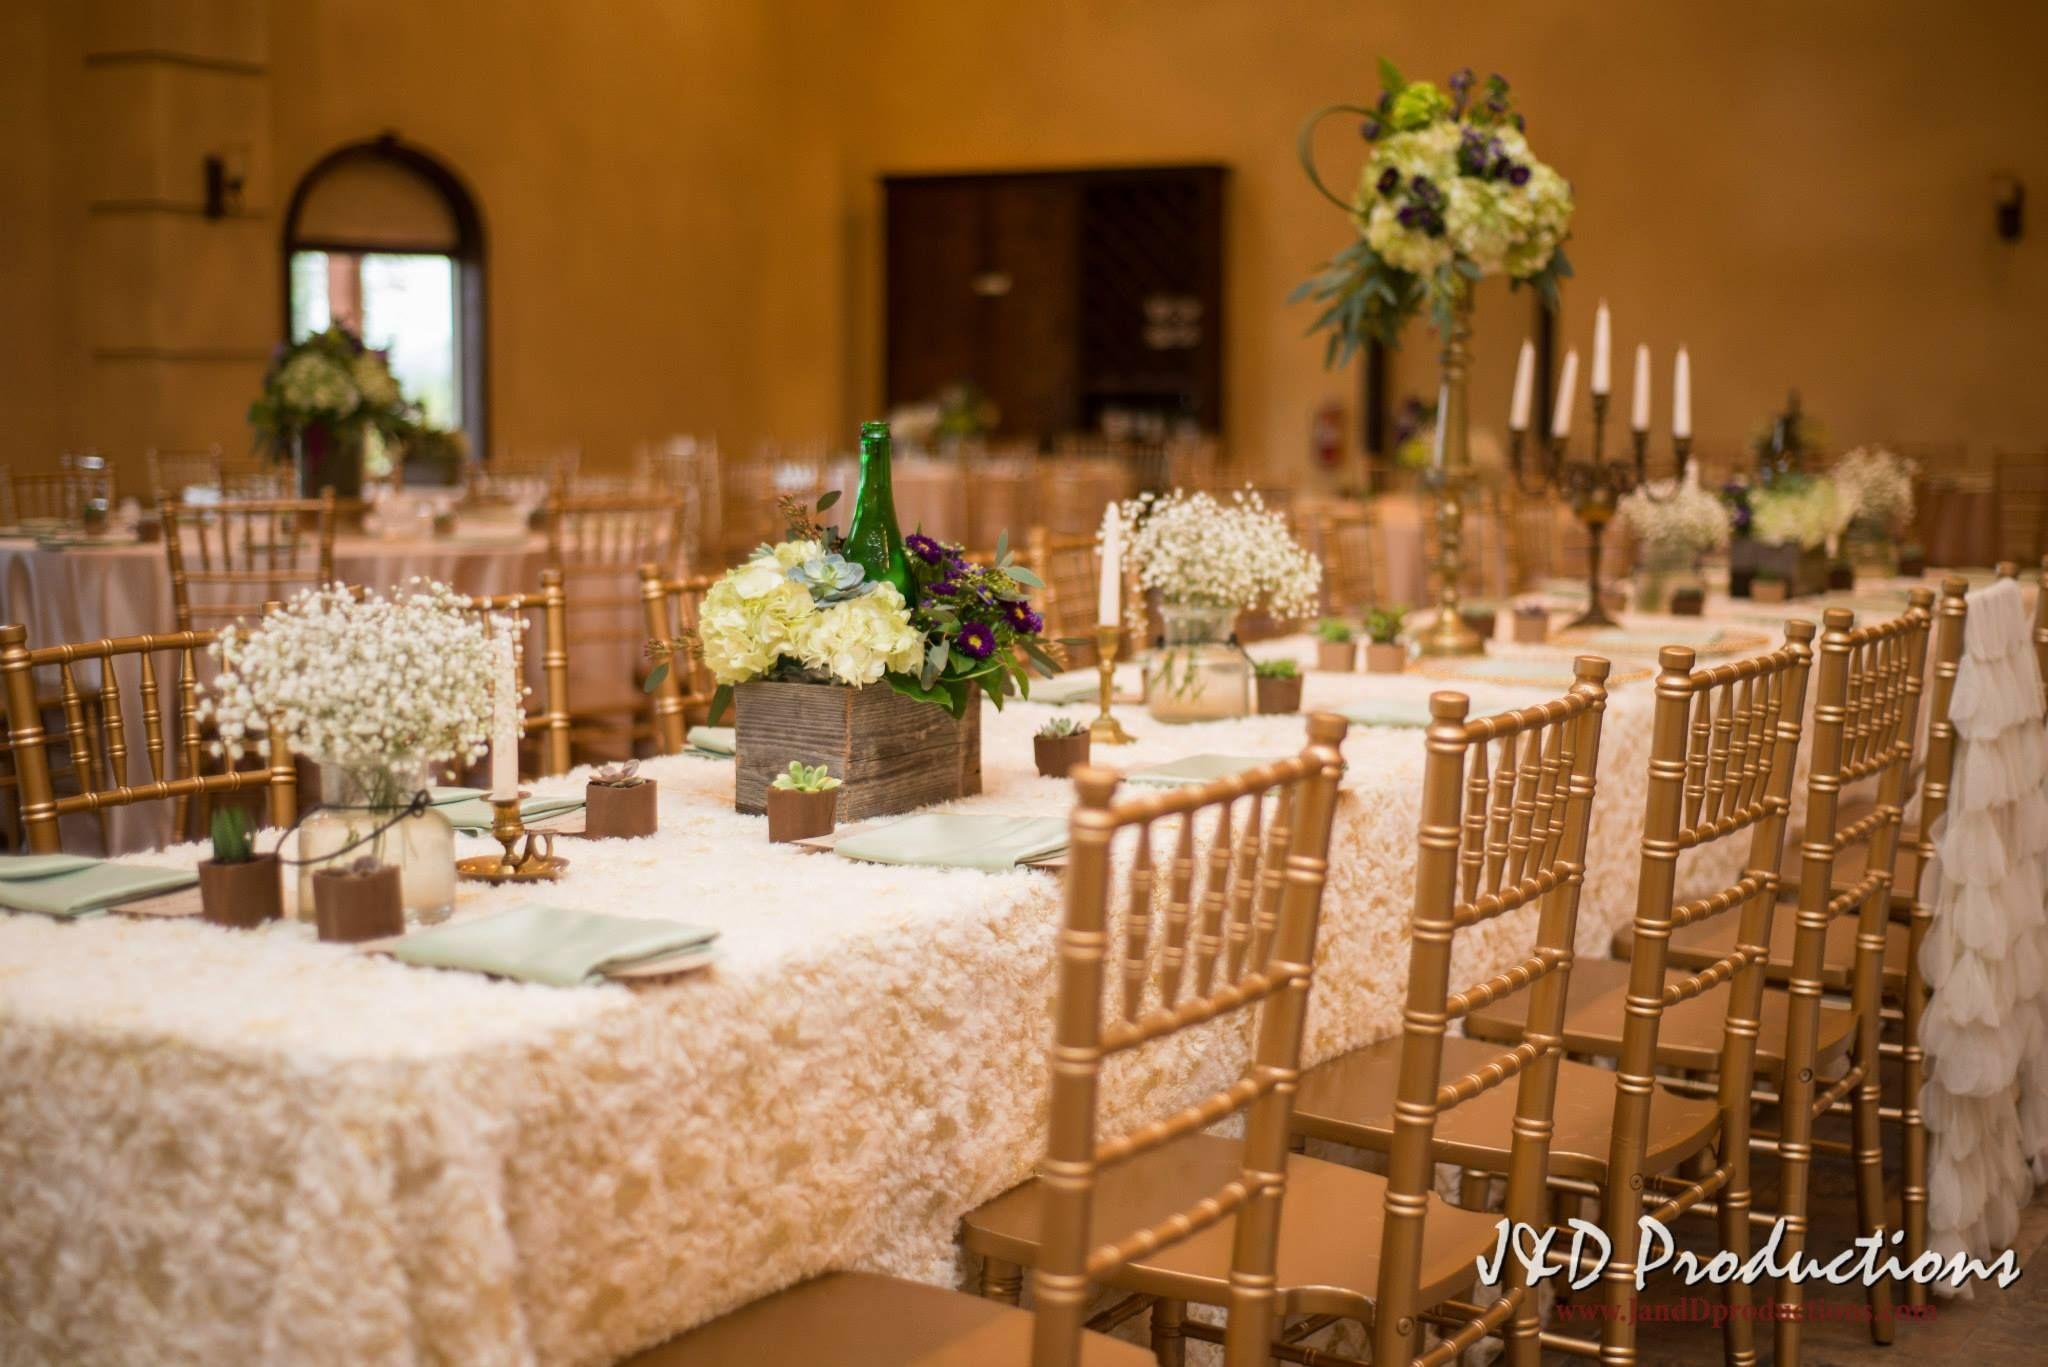 Wedding Centerpieces Outdoor Weddings In Houston Ceremony Clear